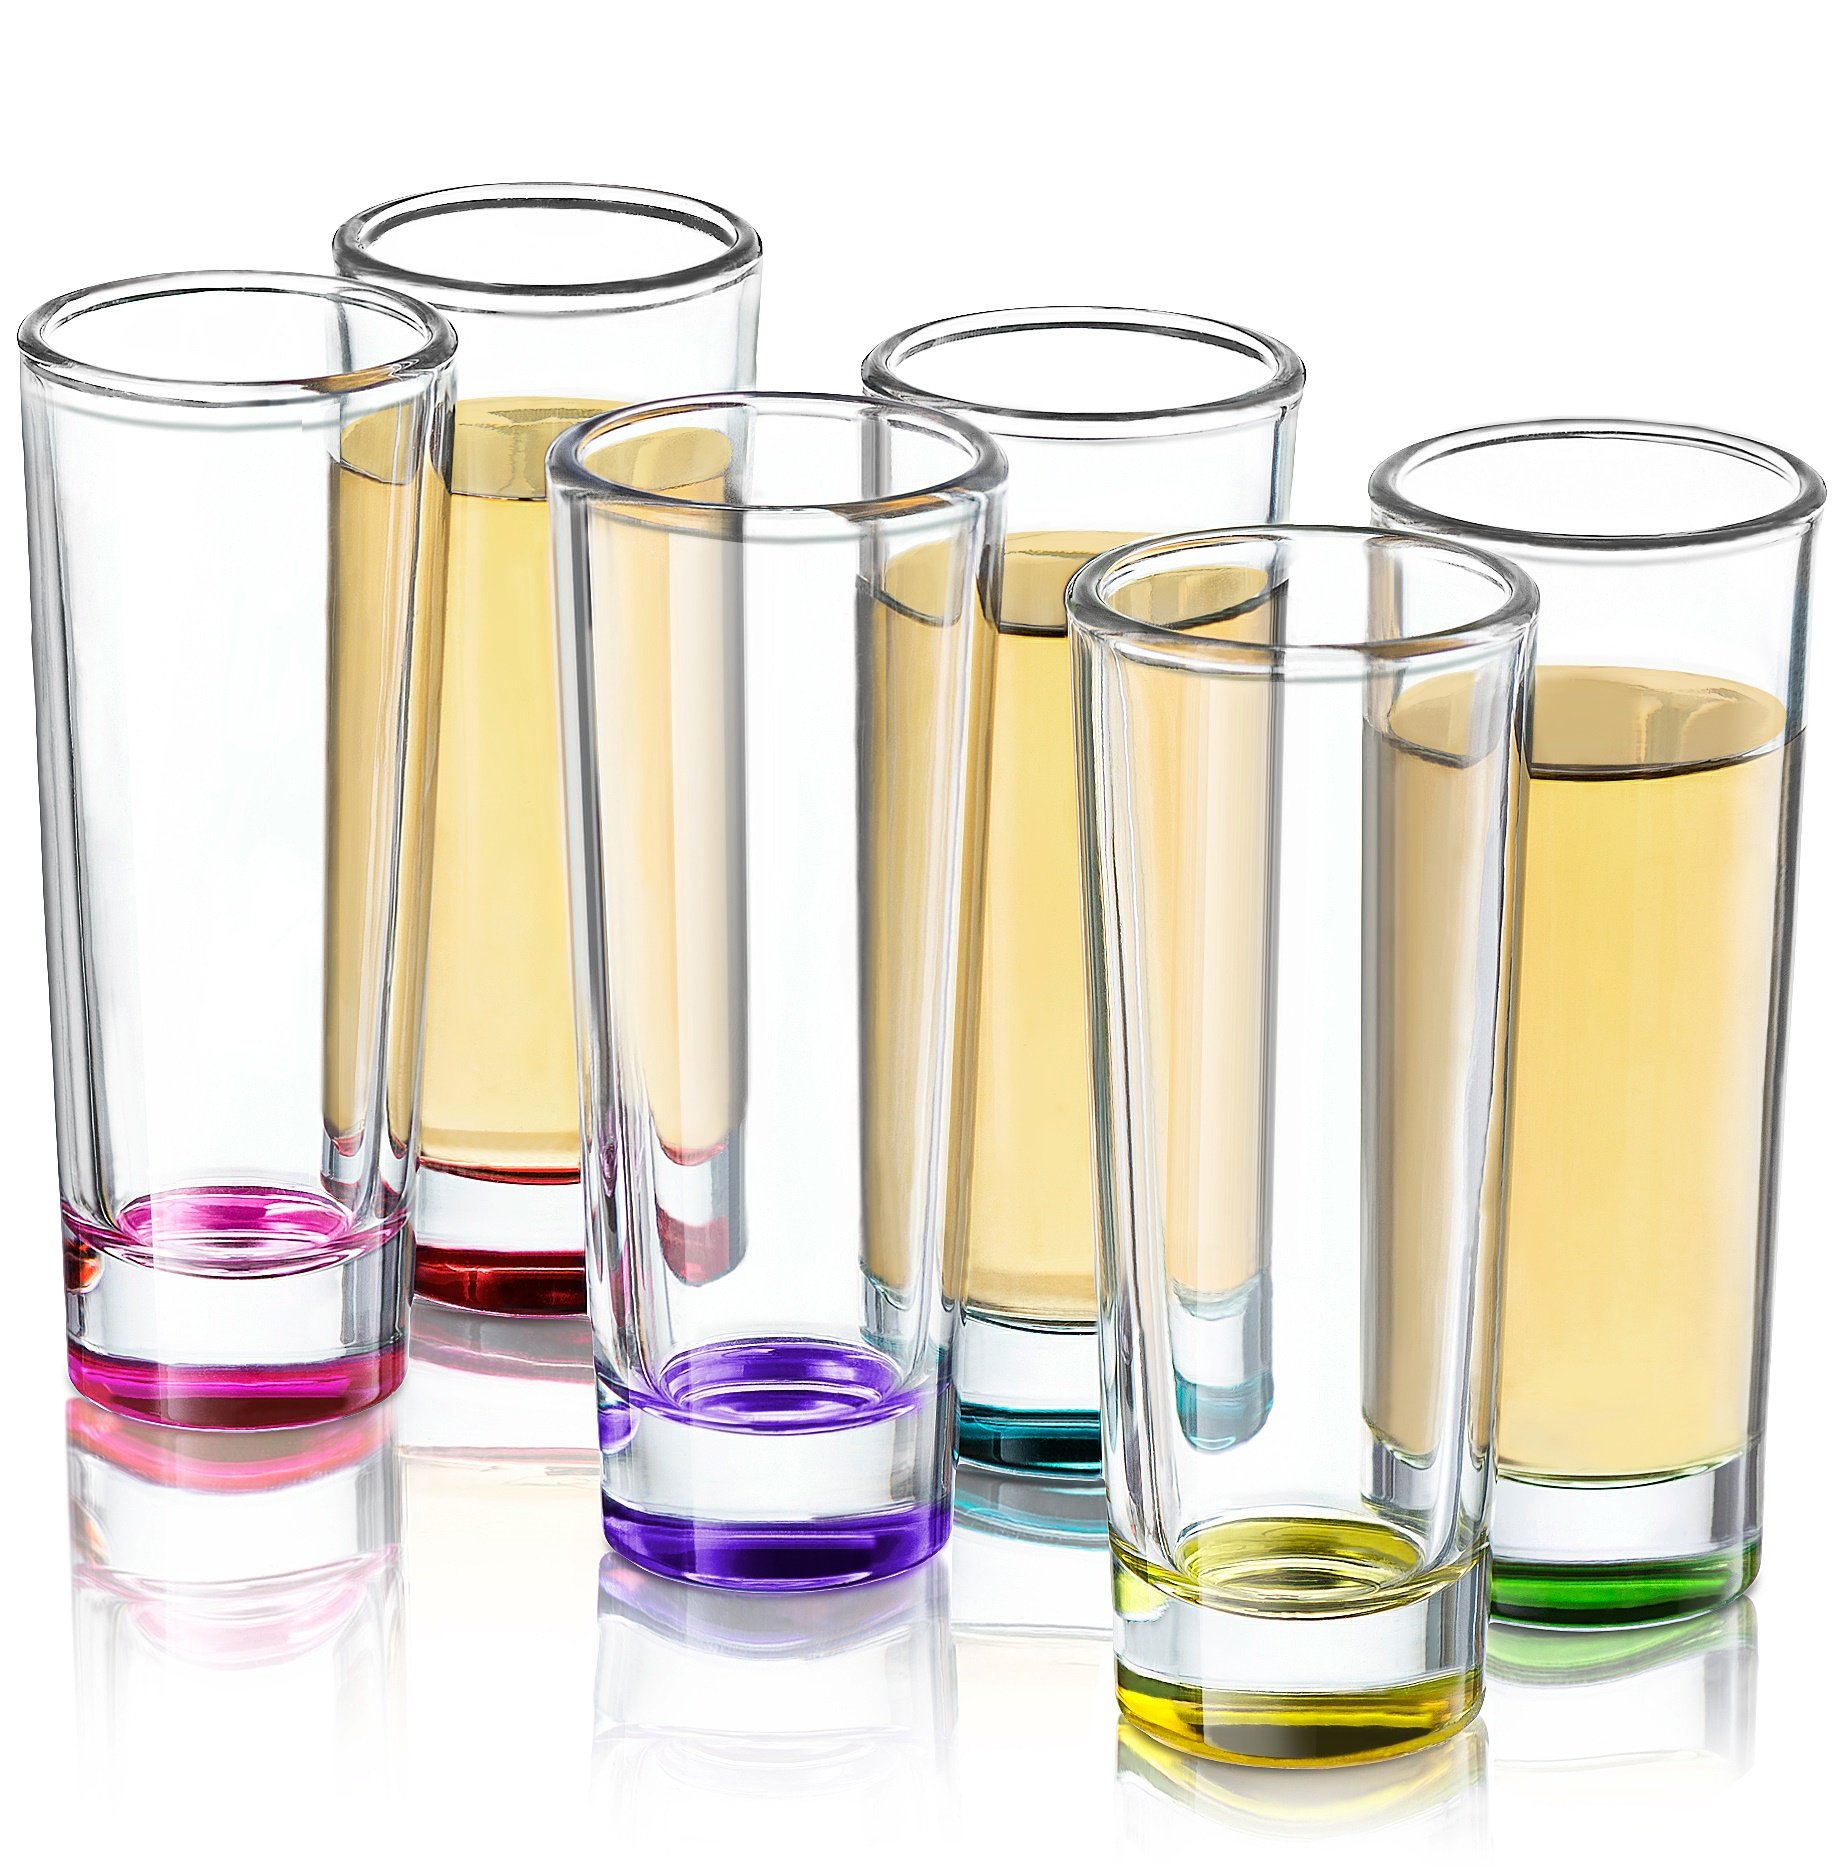 JoyJolt Hue Colored Shot glass Set, 6 Piece Shot Glasses - 2-Ounces. by JoyJolt